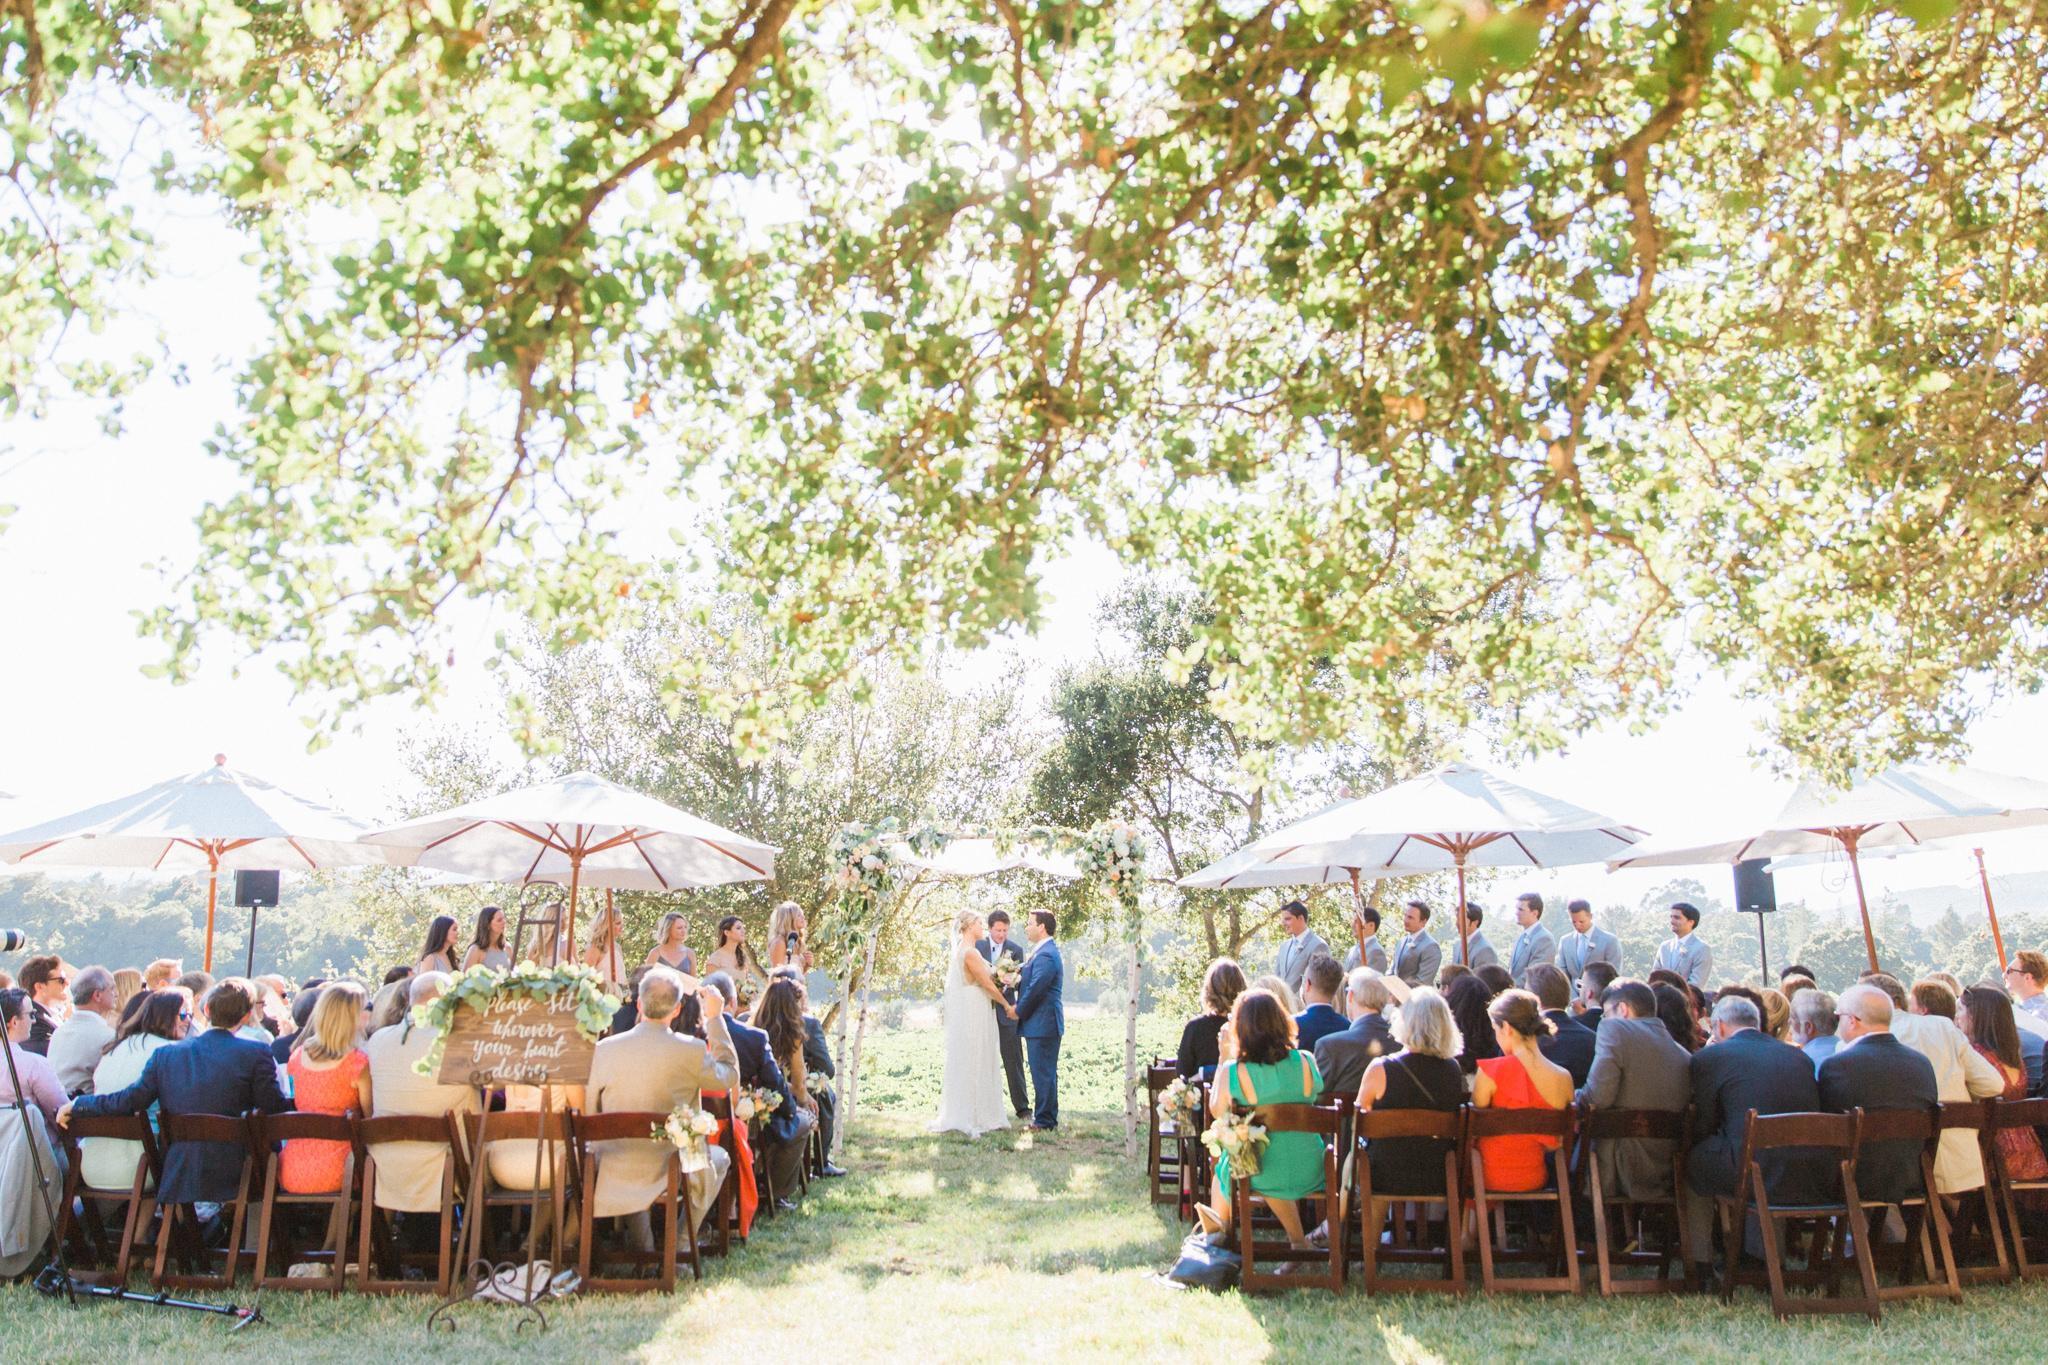 Gundlach Bundschu Sonoma Wedding